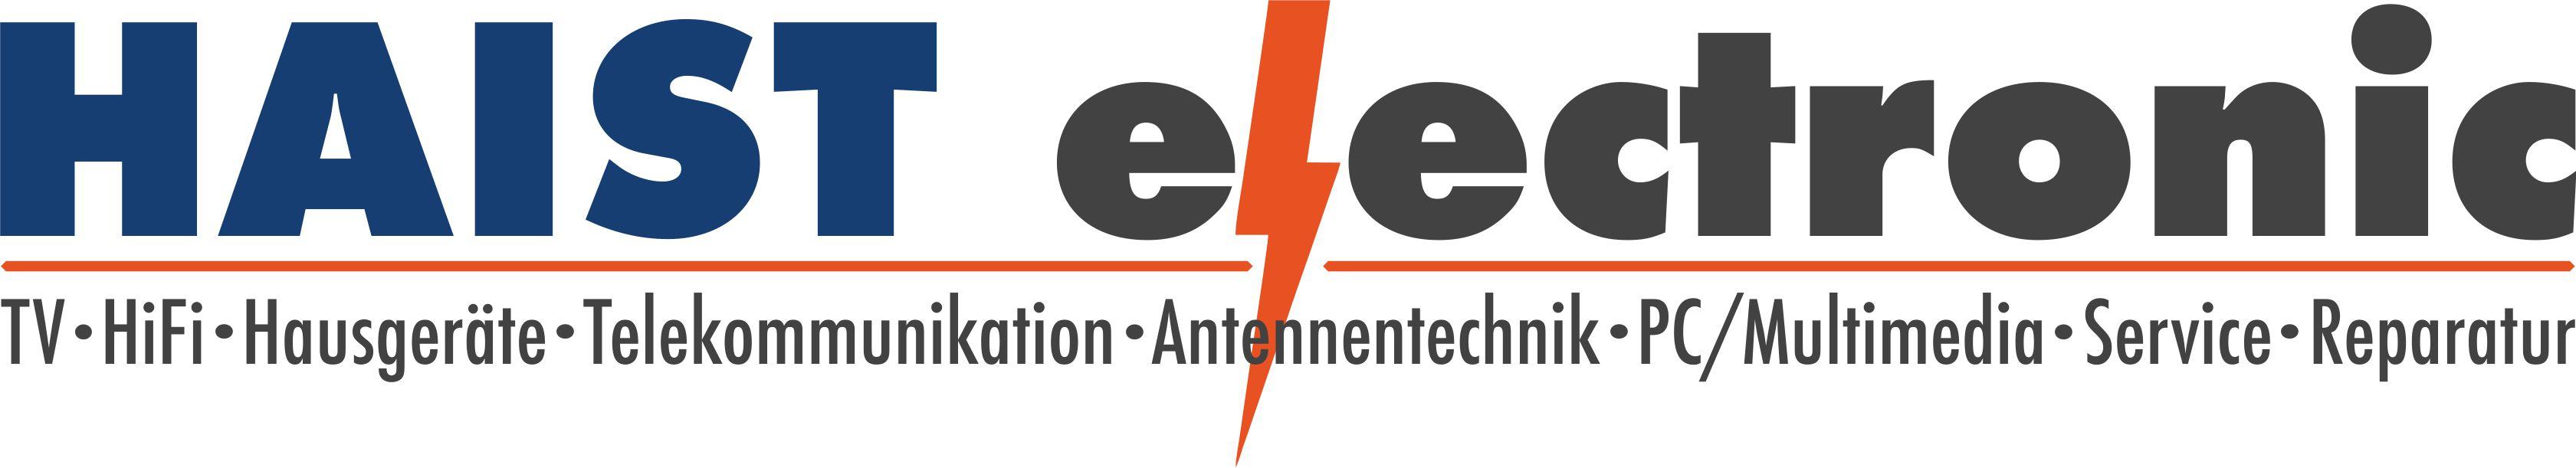 Haist Electronic - Webshop